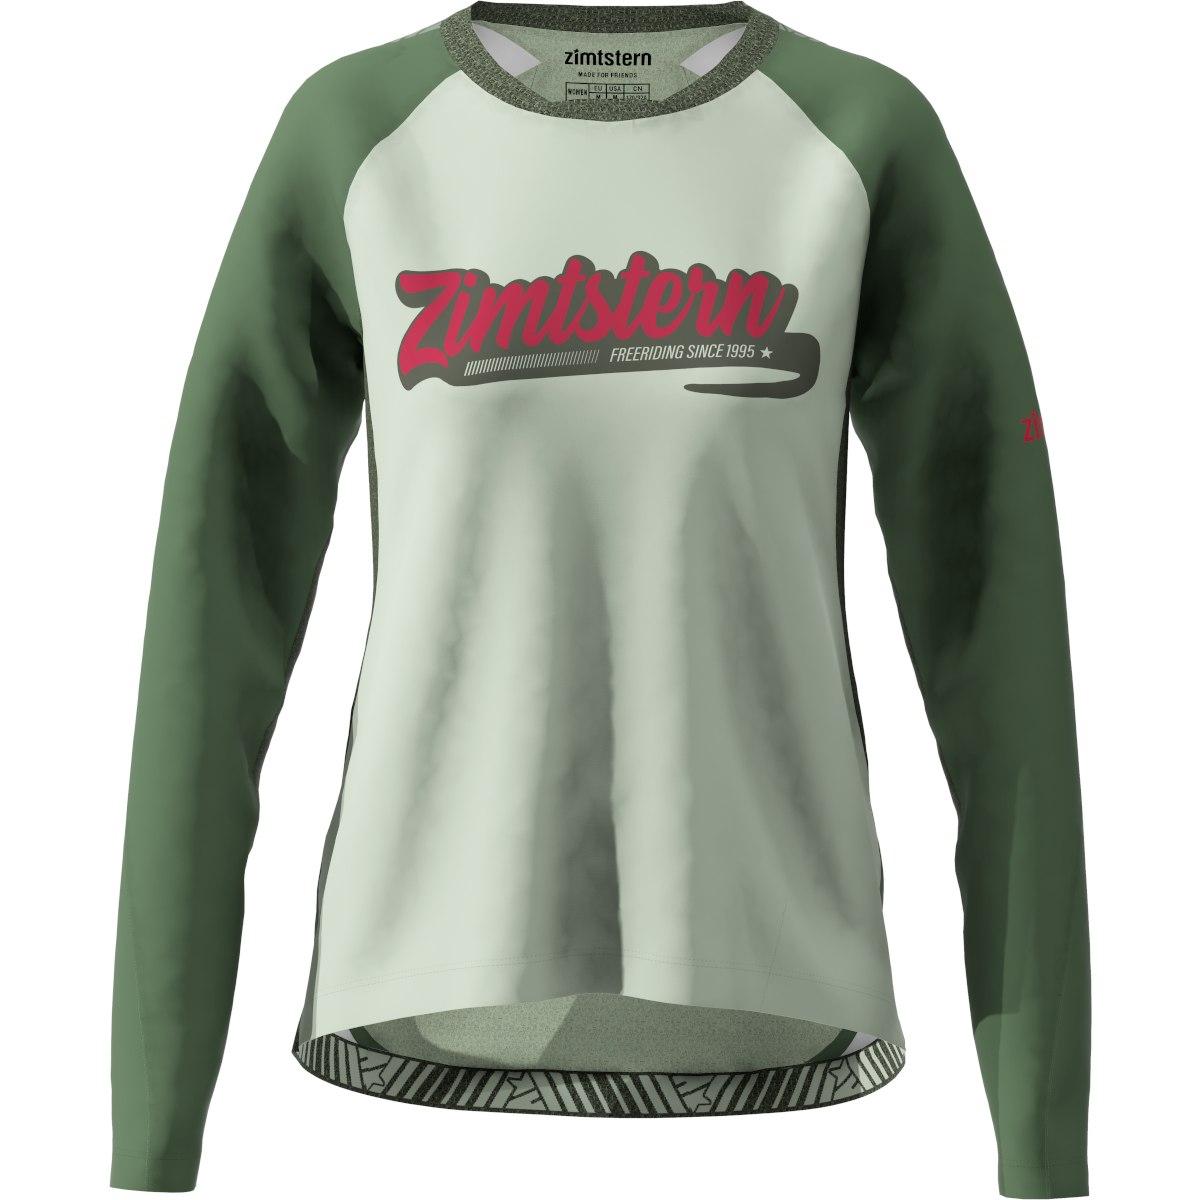 Zimtstern ProTechZonez Windbreaker MTB-Langarmshirt für Damen - bronze green/pirate black